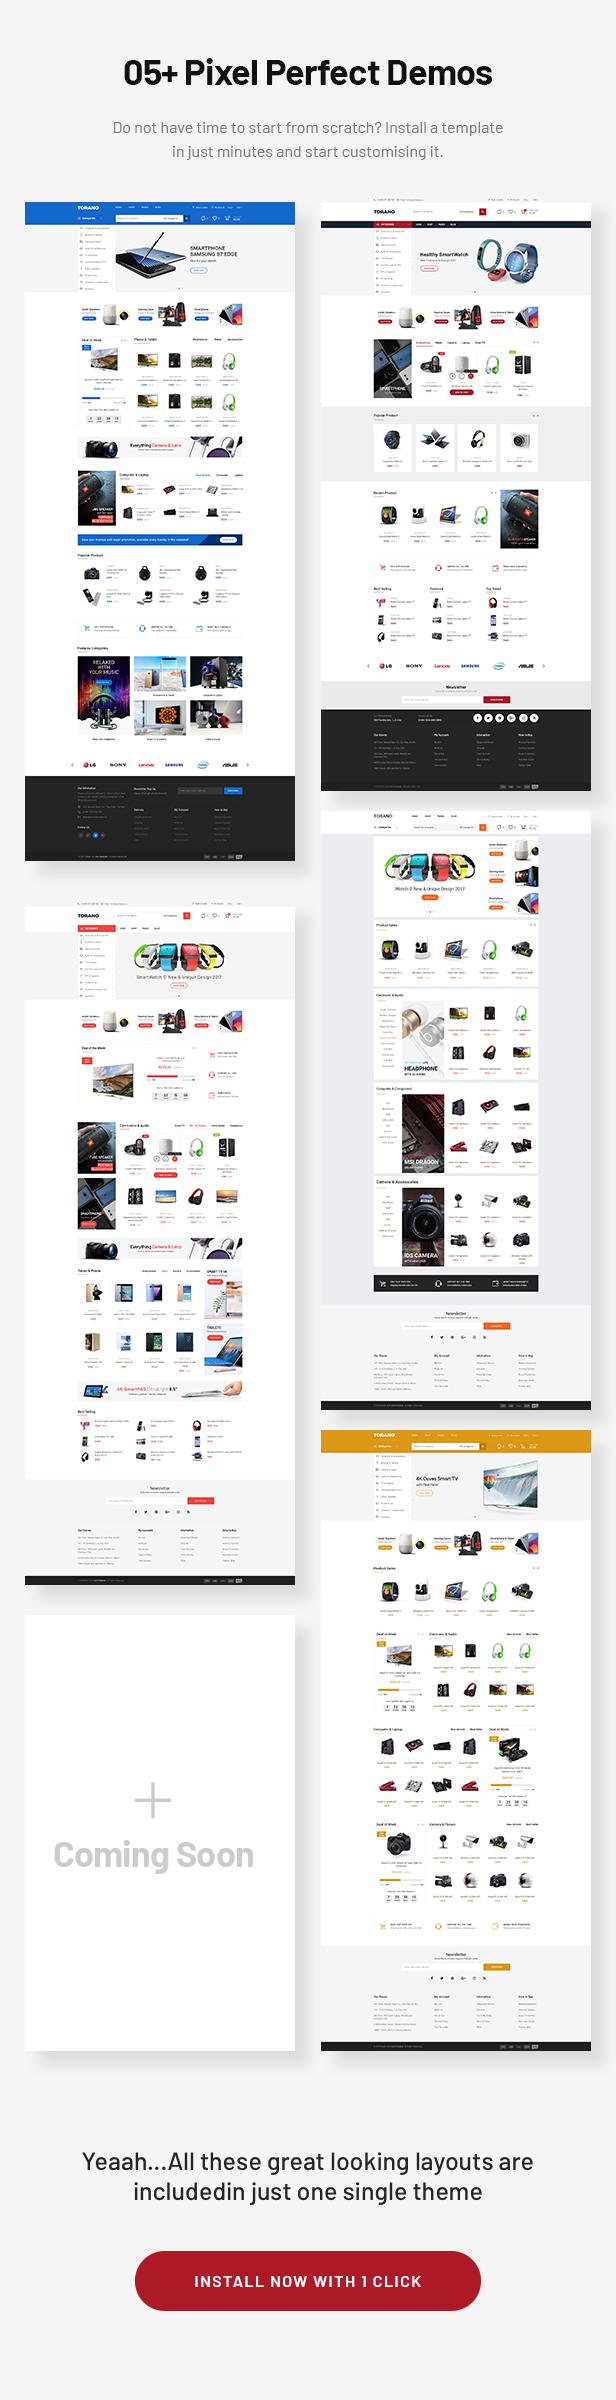 Torano - Supermarket Marketplace Ultimate Shopify Theme Section Ready - 3